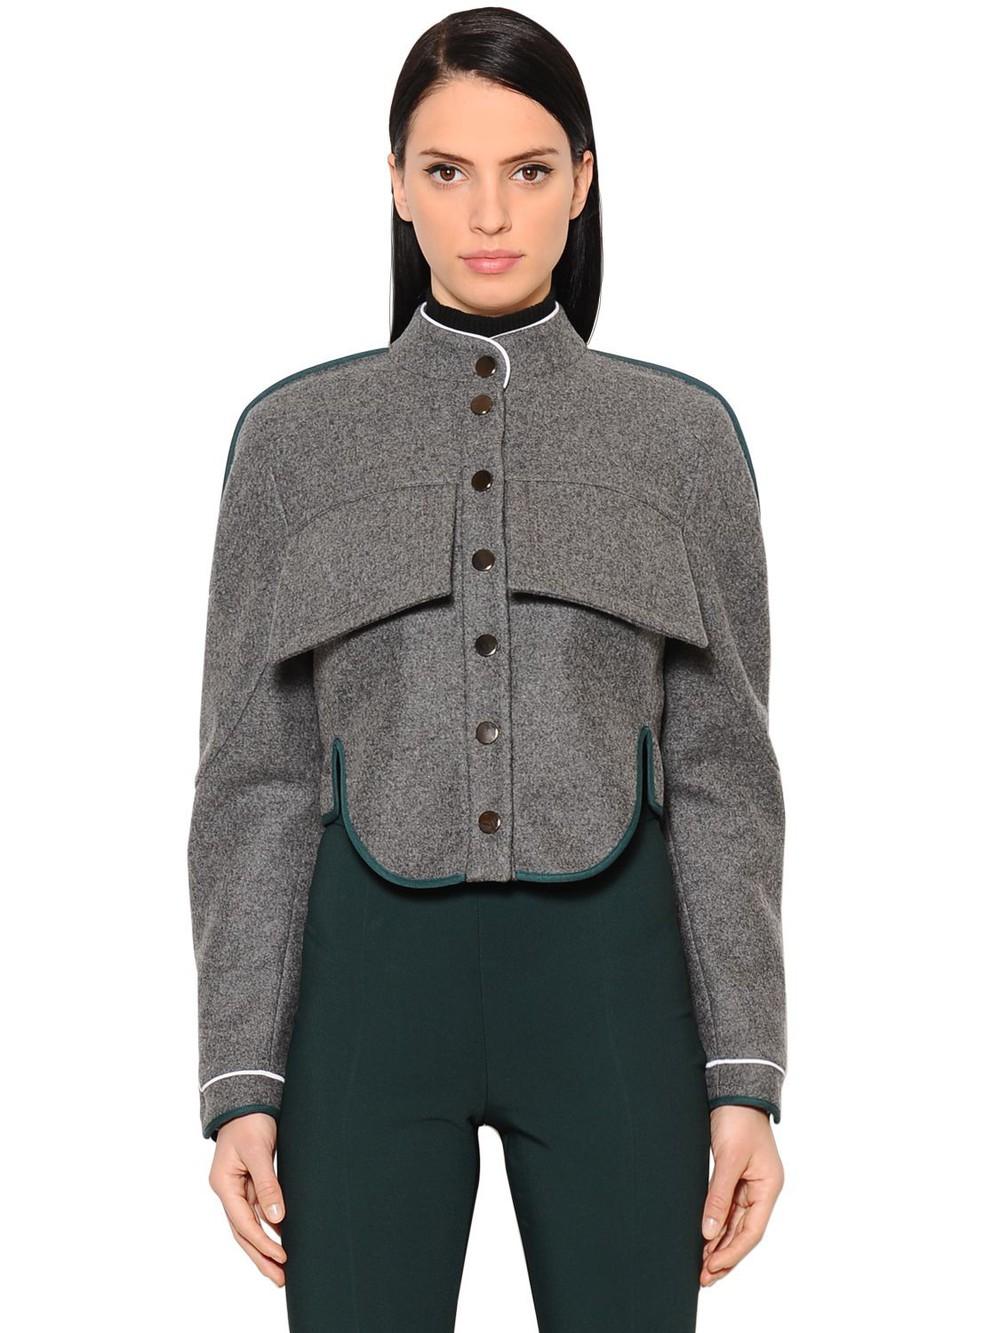 ANTONIO BERARDI Short Wool & Cashmere Jacket in grey